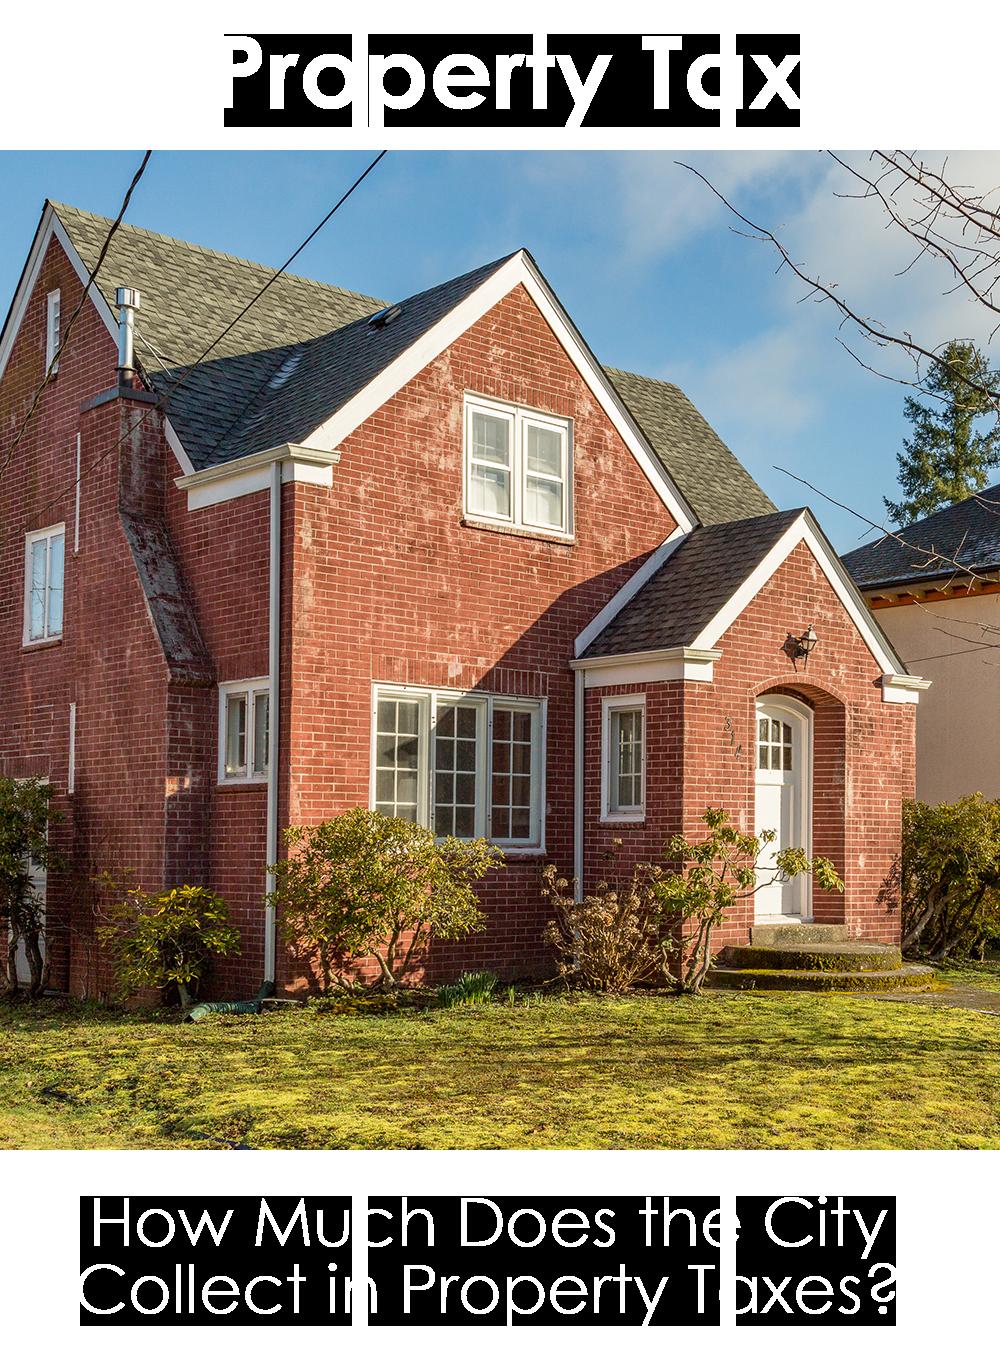 Olympia brick home in sunshine